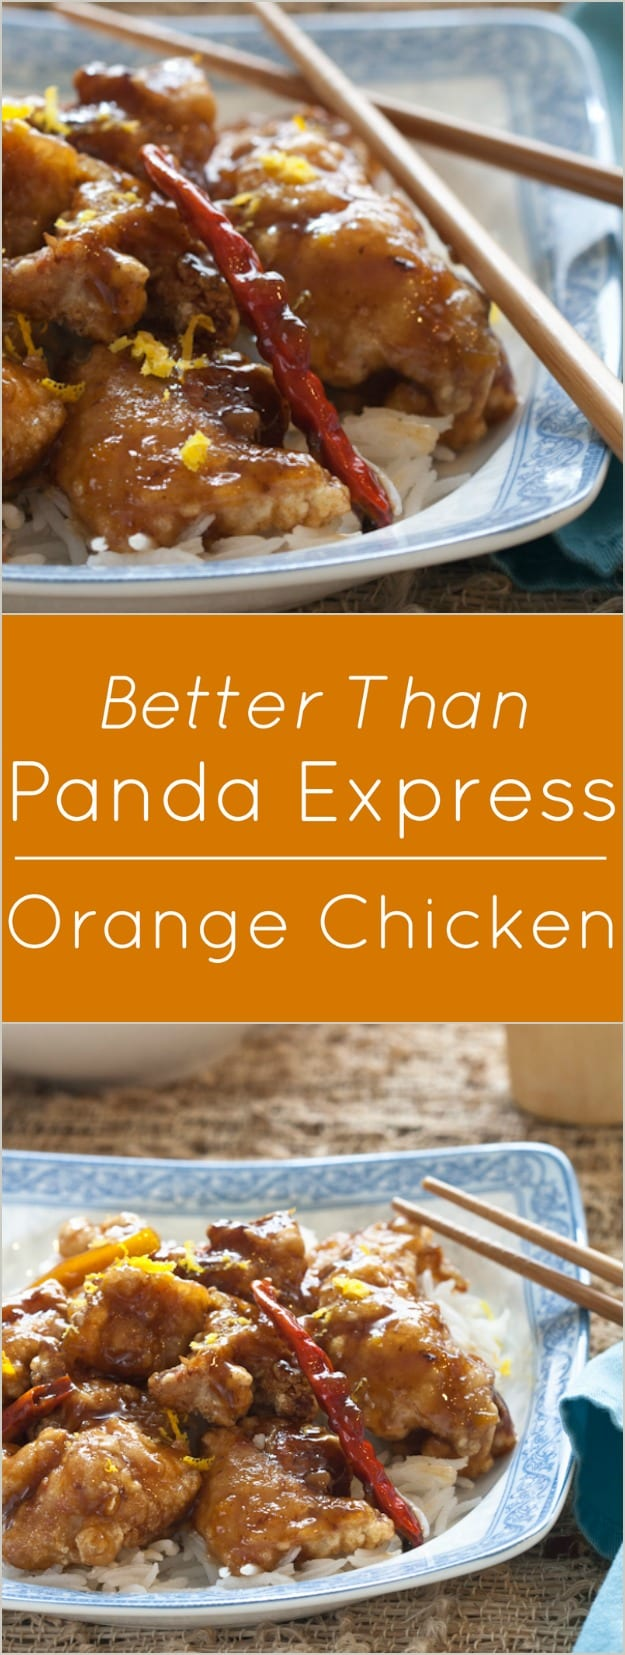 Better than Panda Express Orange Flavored Chicken.